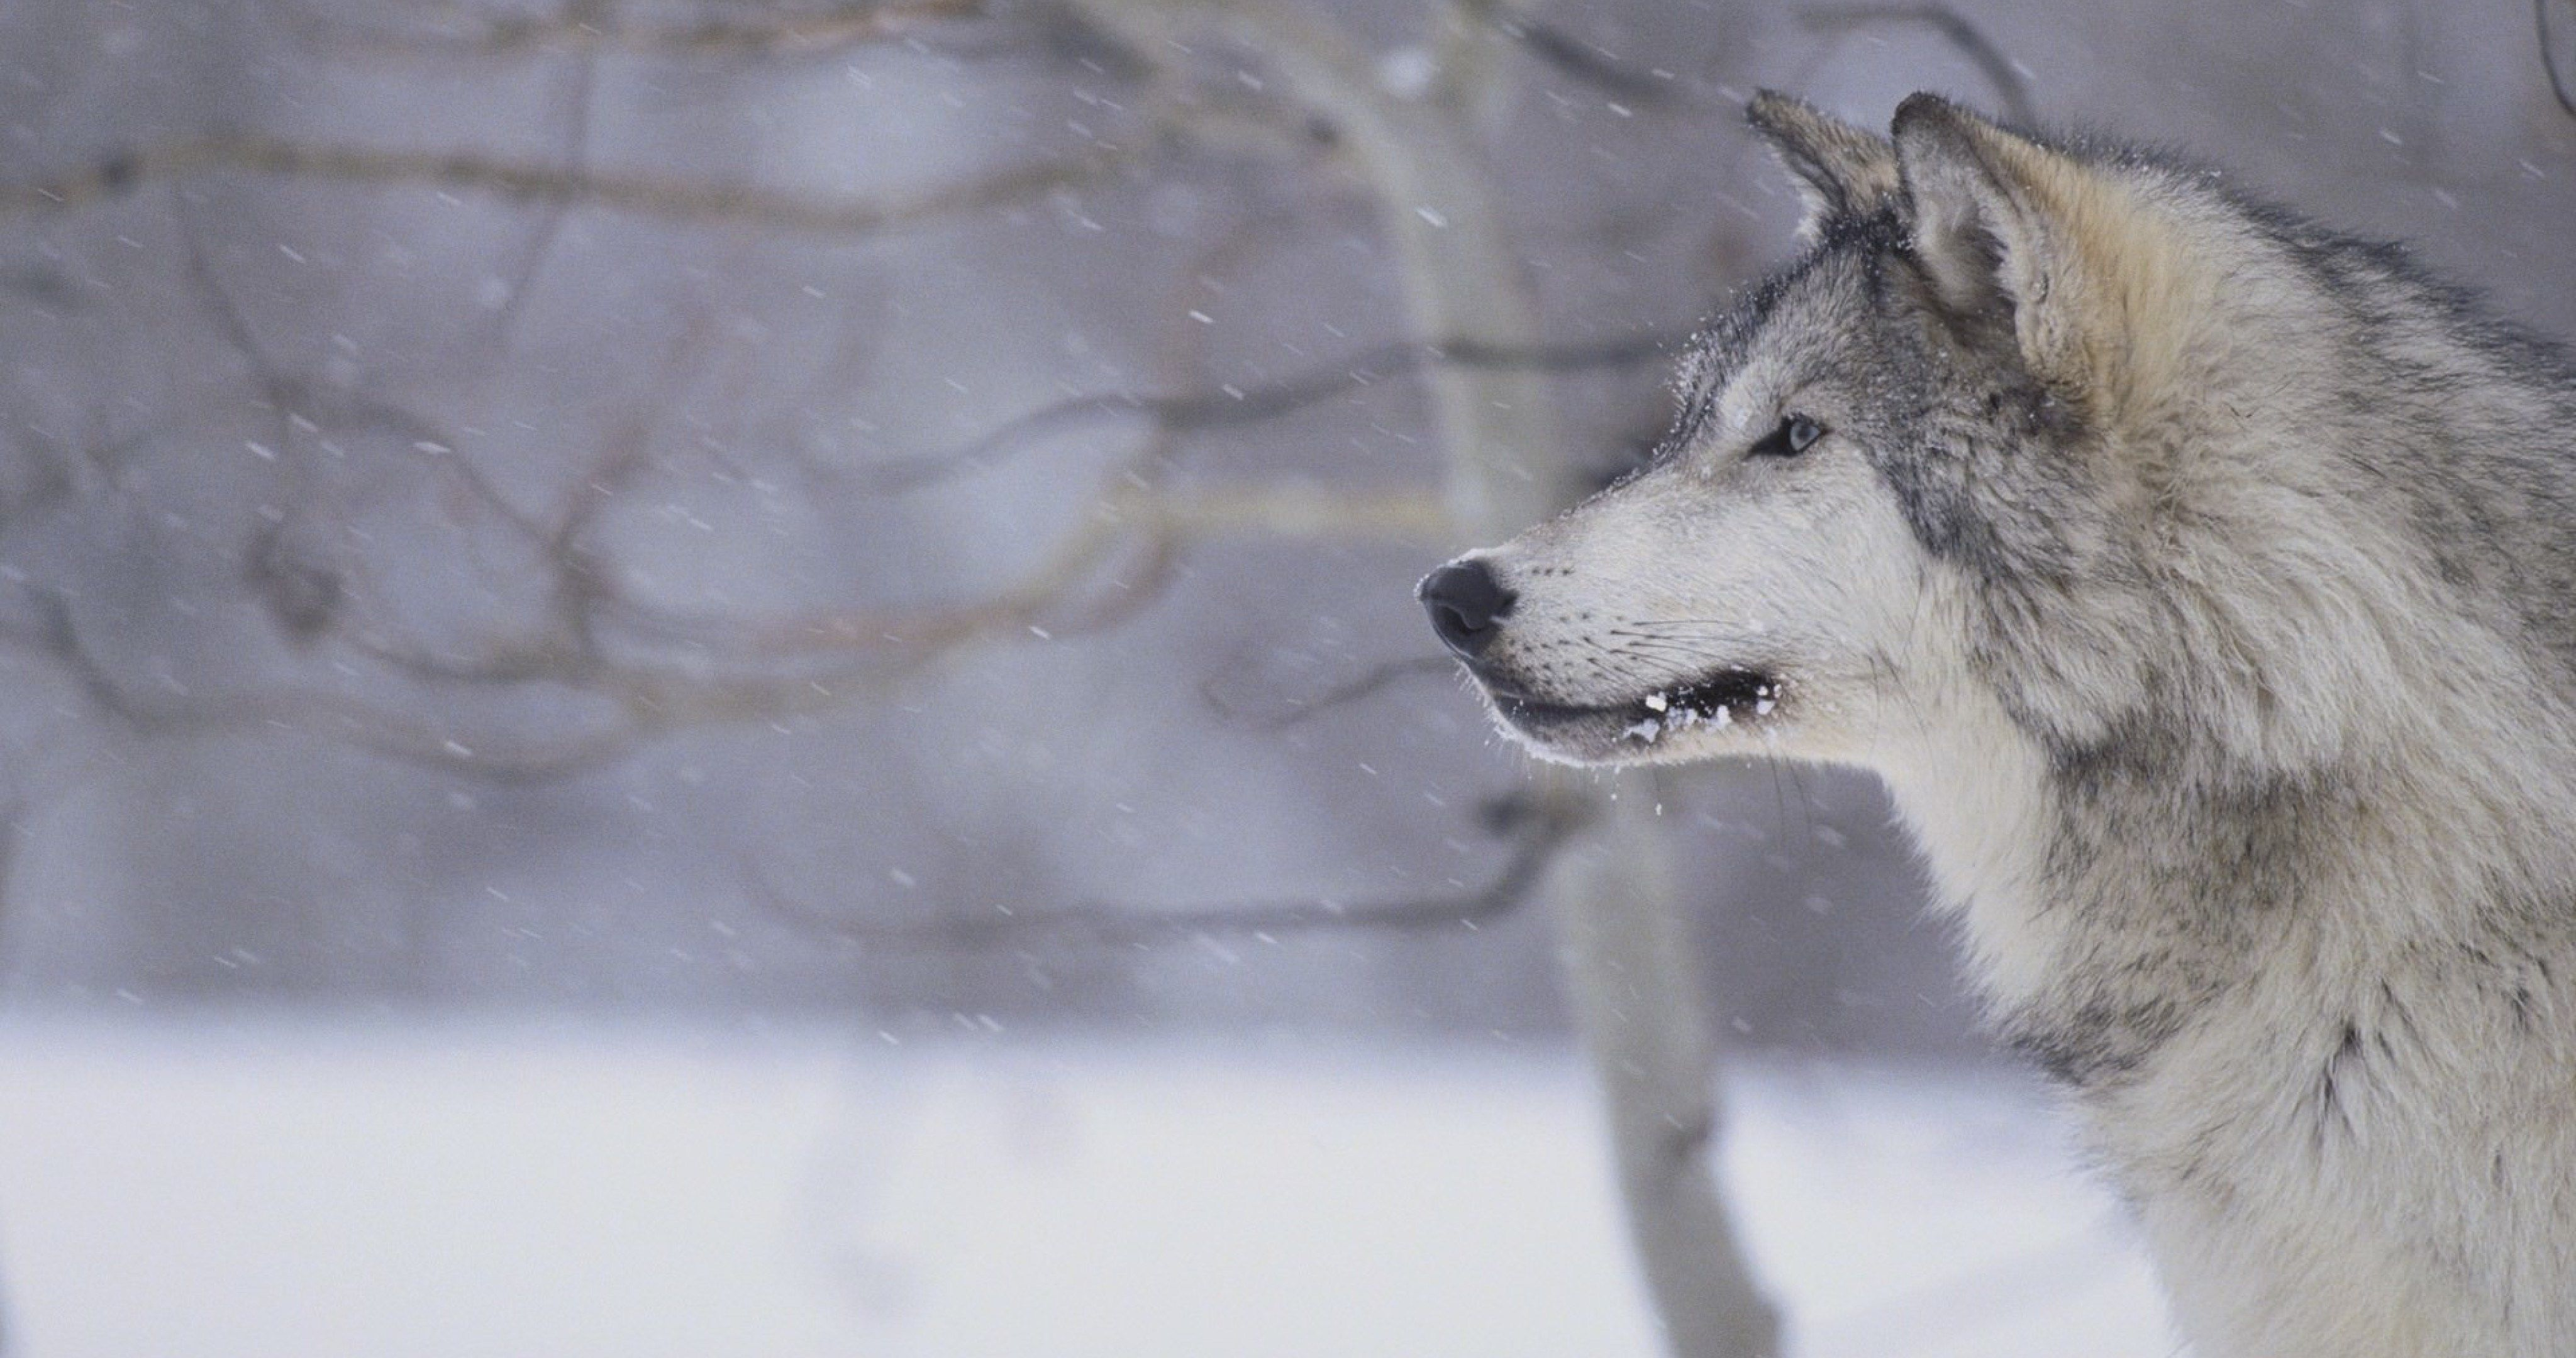 Wolf Winter Wallpaper Hd 4k Ultra Hd Wallpaper Grey Wolf Beautiful Wolves Wolf Photos